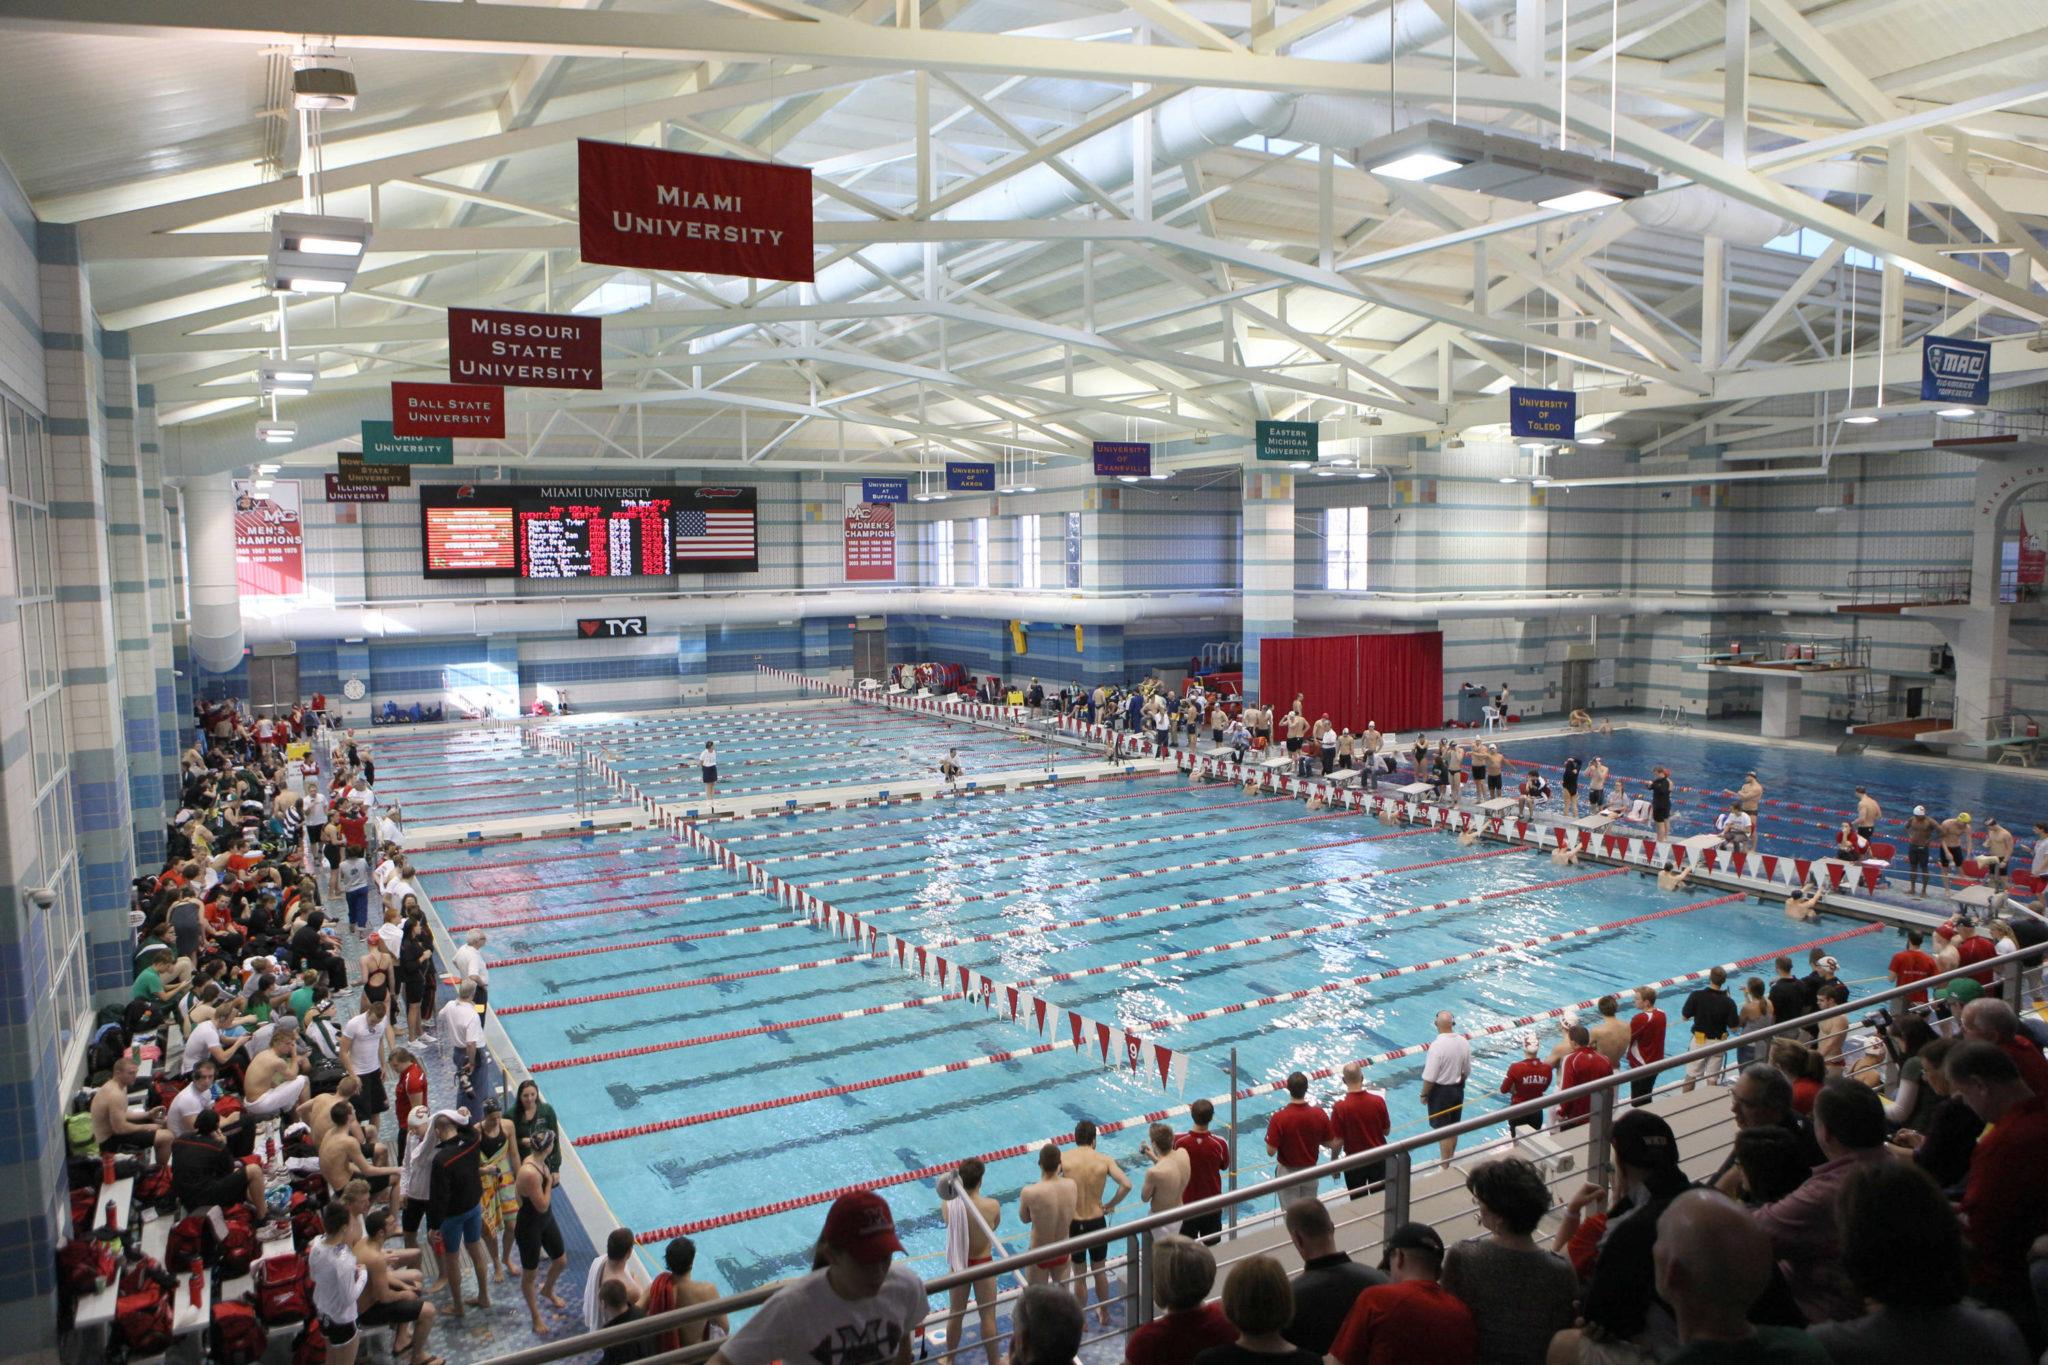 Miami University Academic Calendar 2020-21 2019 Miami University Swim Camp   Sign Up Today